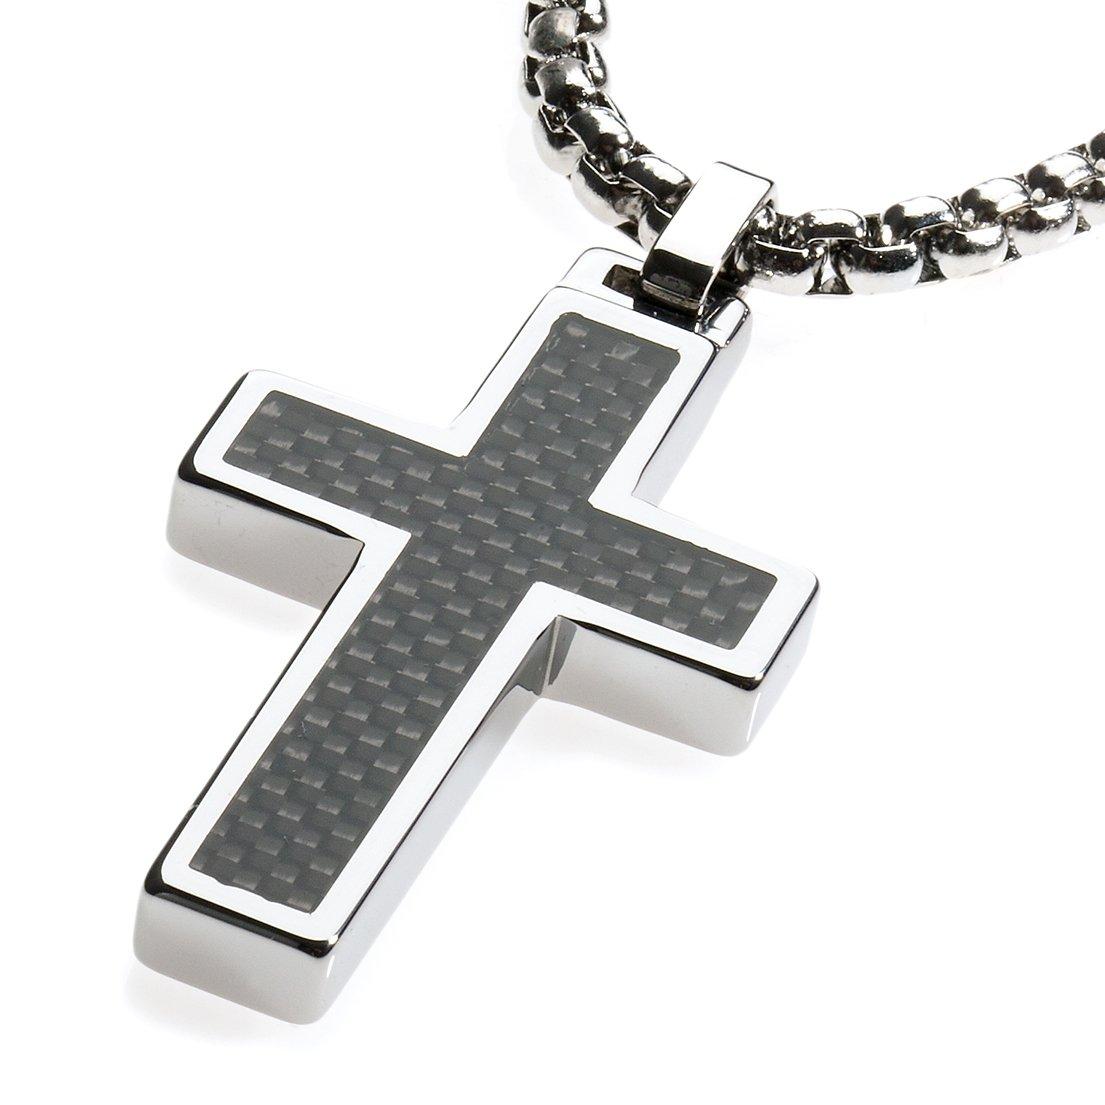 Unique GESTALT Tungsten Cross Pendant .4mm Surgical Stainless Steel Box Chain. Black Carbon Fiber Inlay. 22 inch Chain.